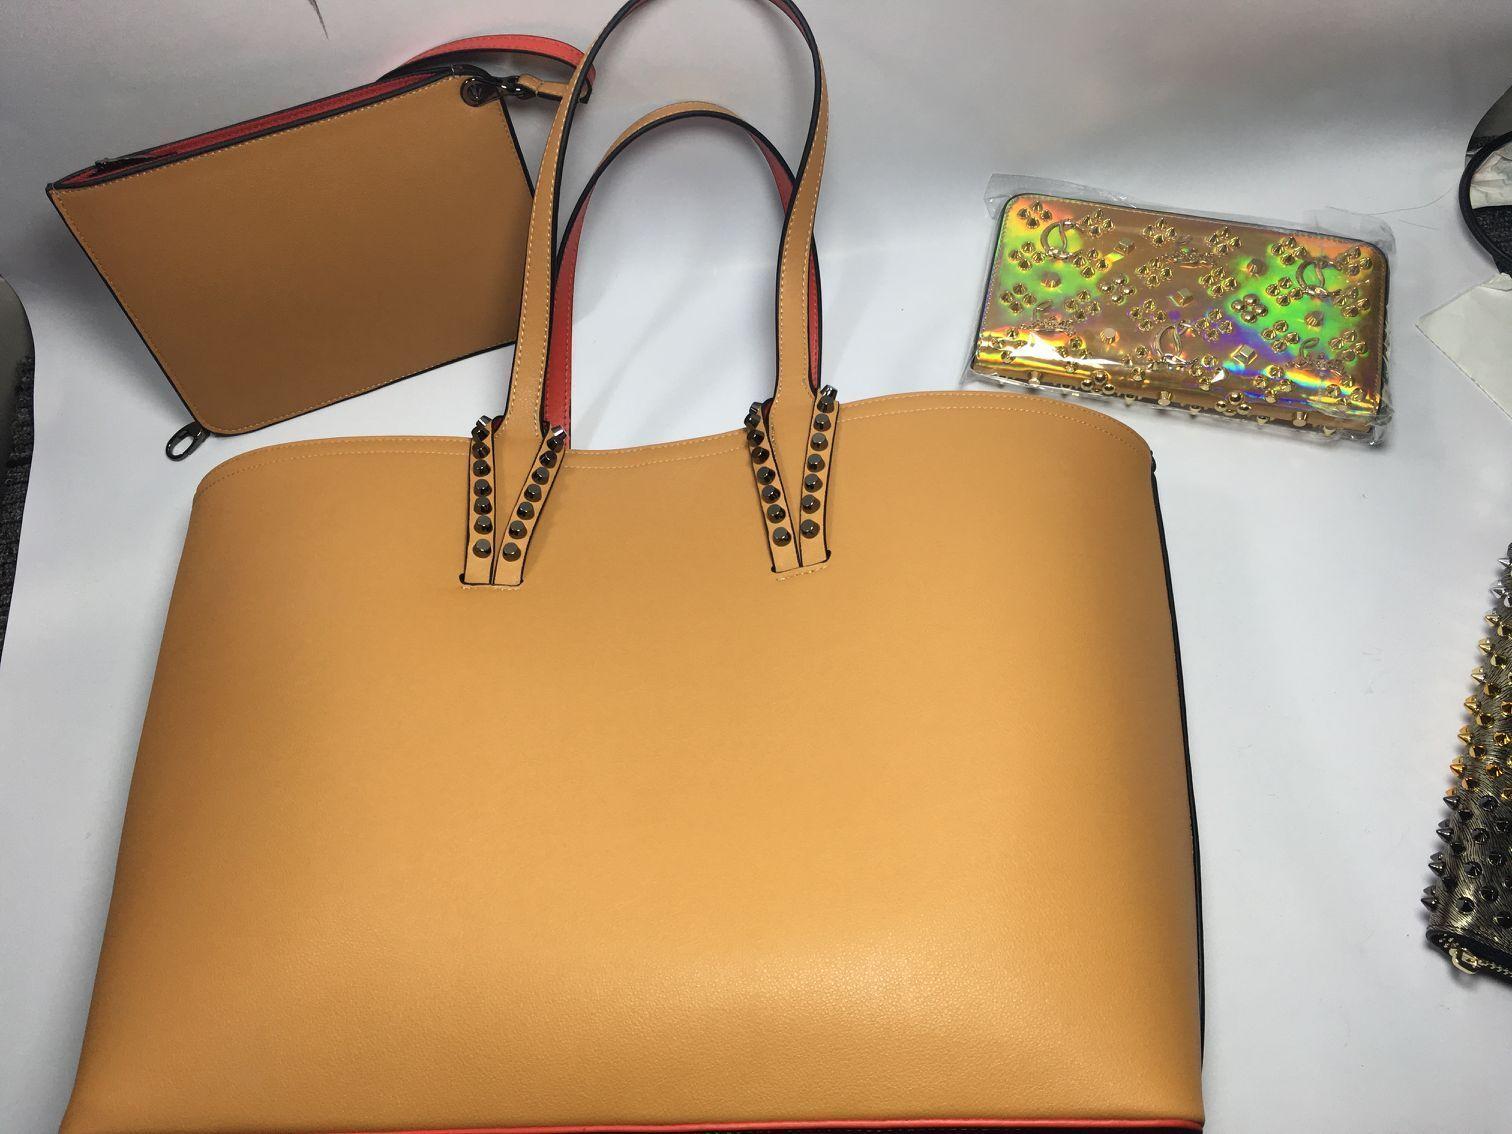 2020 color Top bcabata designer handbags totes composite handbag famous brand genuine leather should purse Big bags